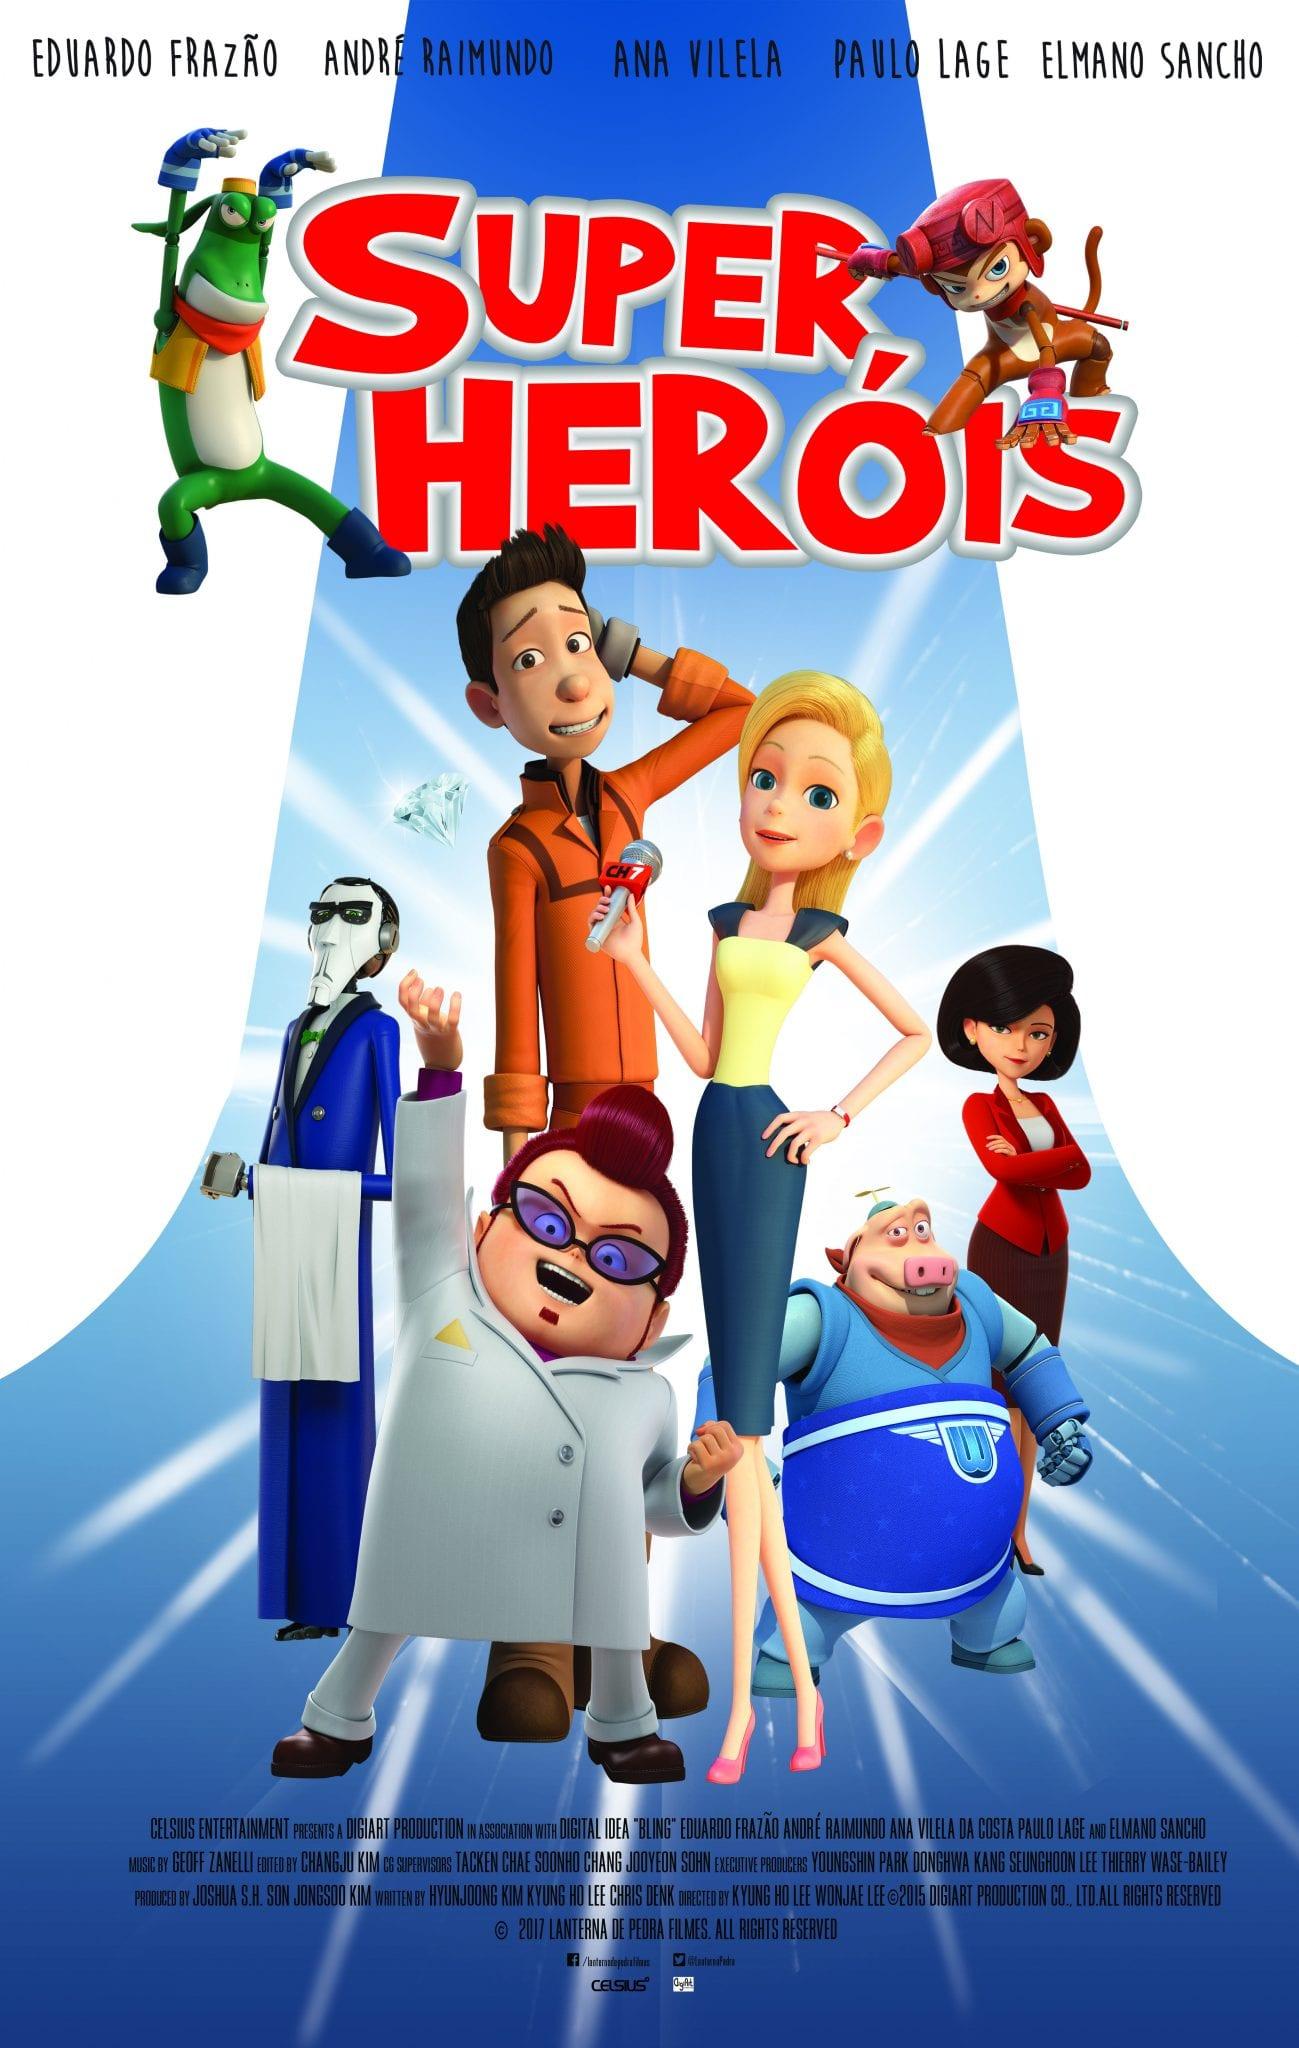 Passatempo Filme: Bling - Super-heróis